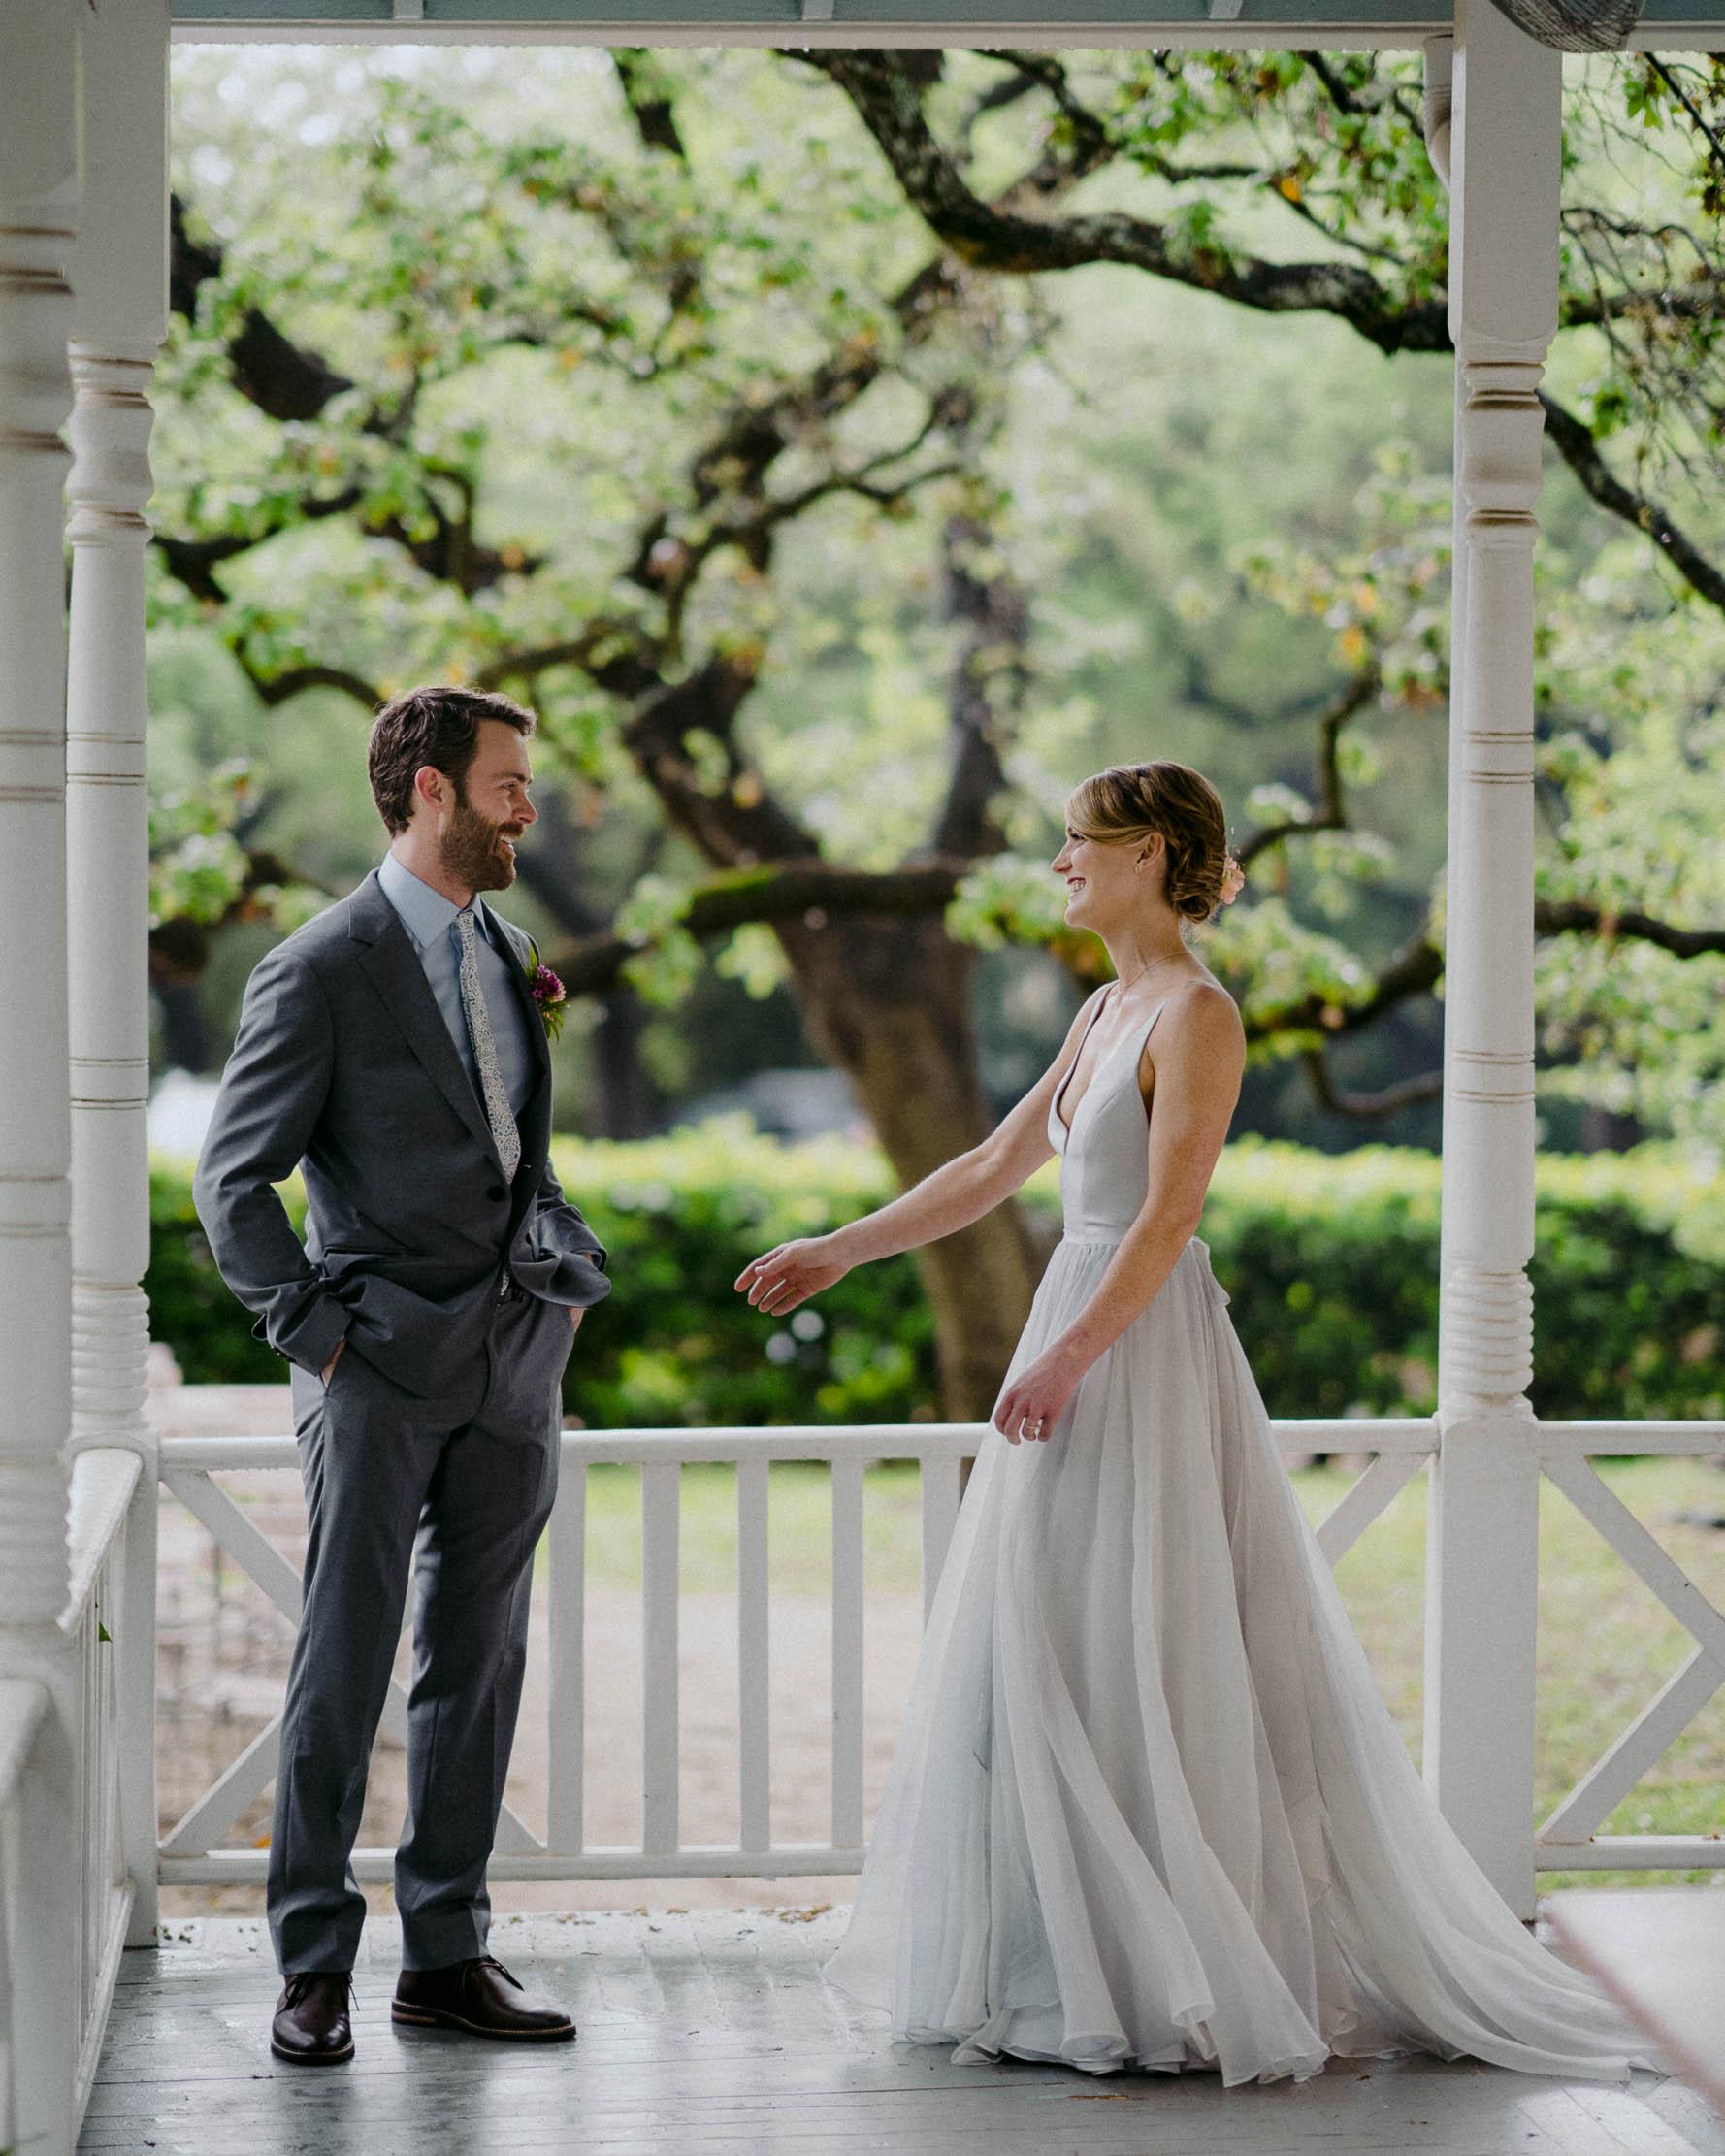 Matties-Green-Pastures-Austin-Wedding-2019.jpg